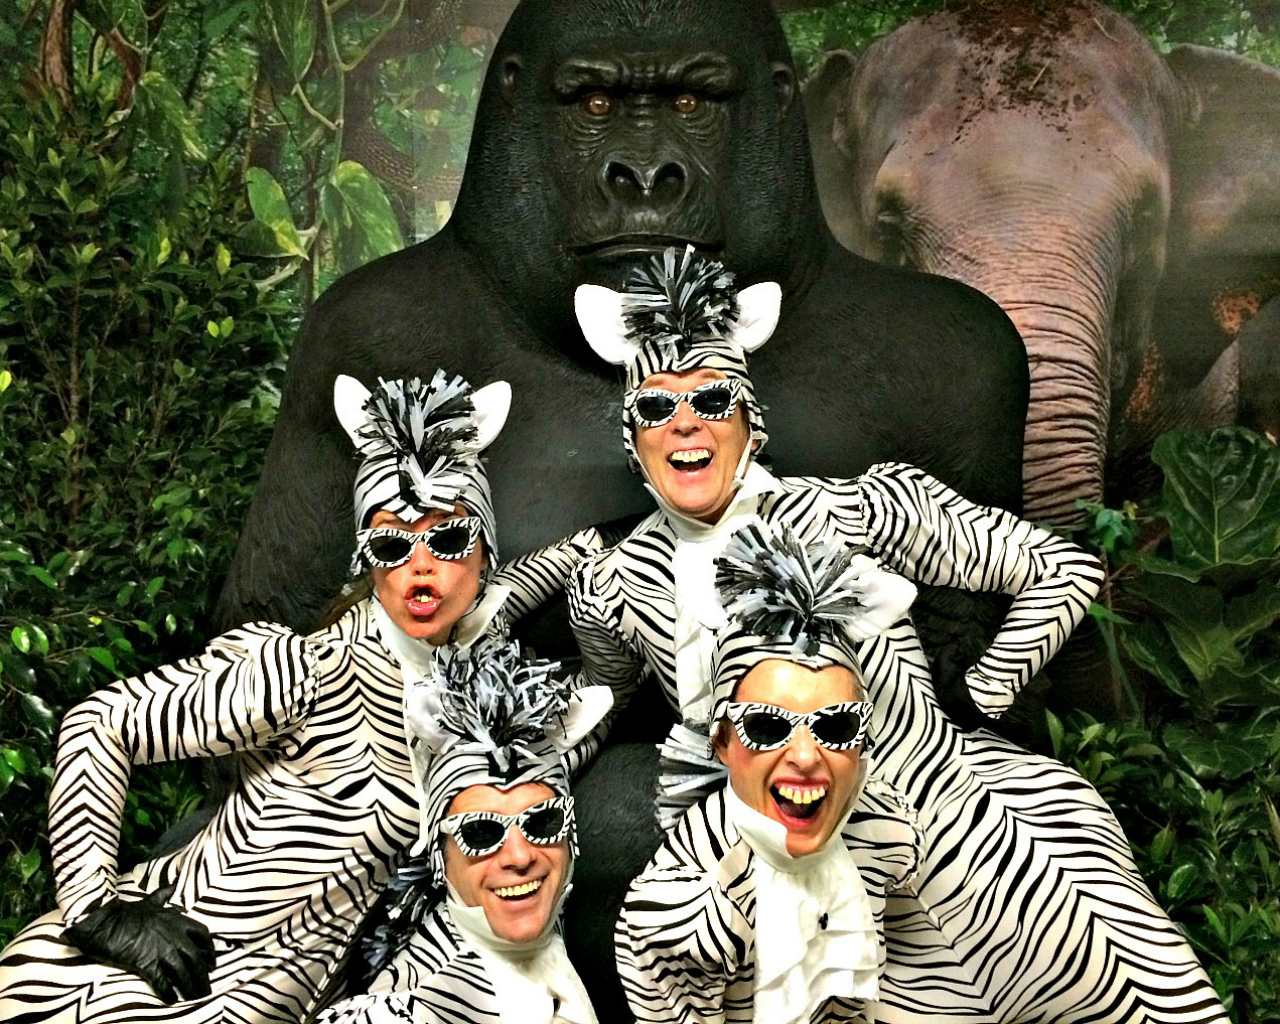 Zebras and Gorilla 1280 x 1024.jpg